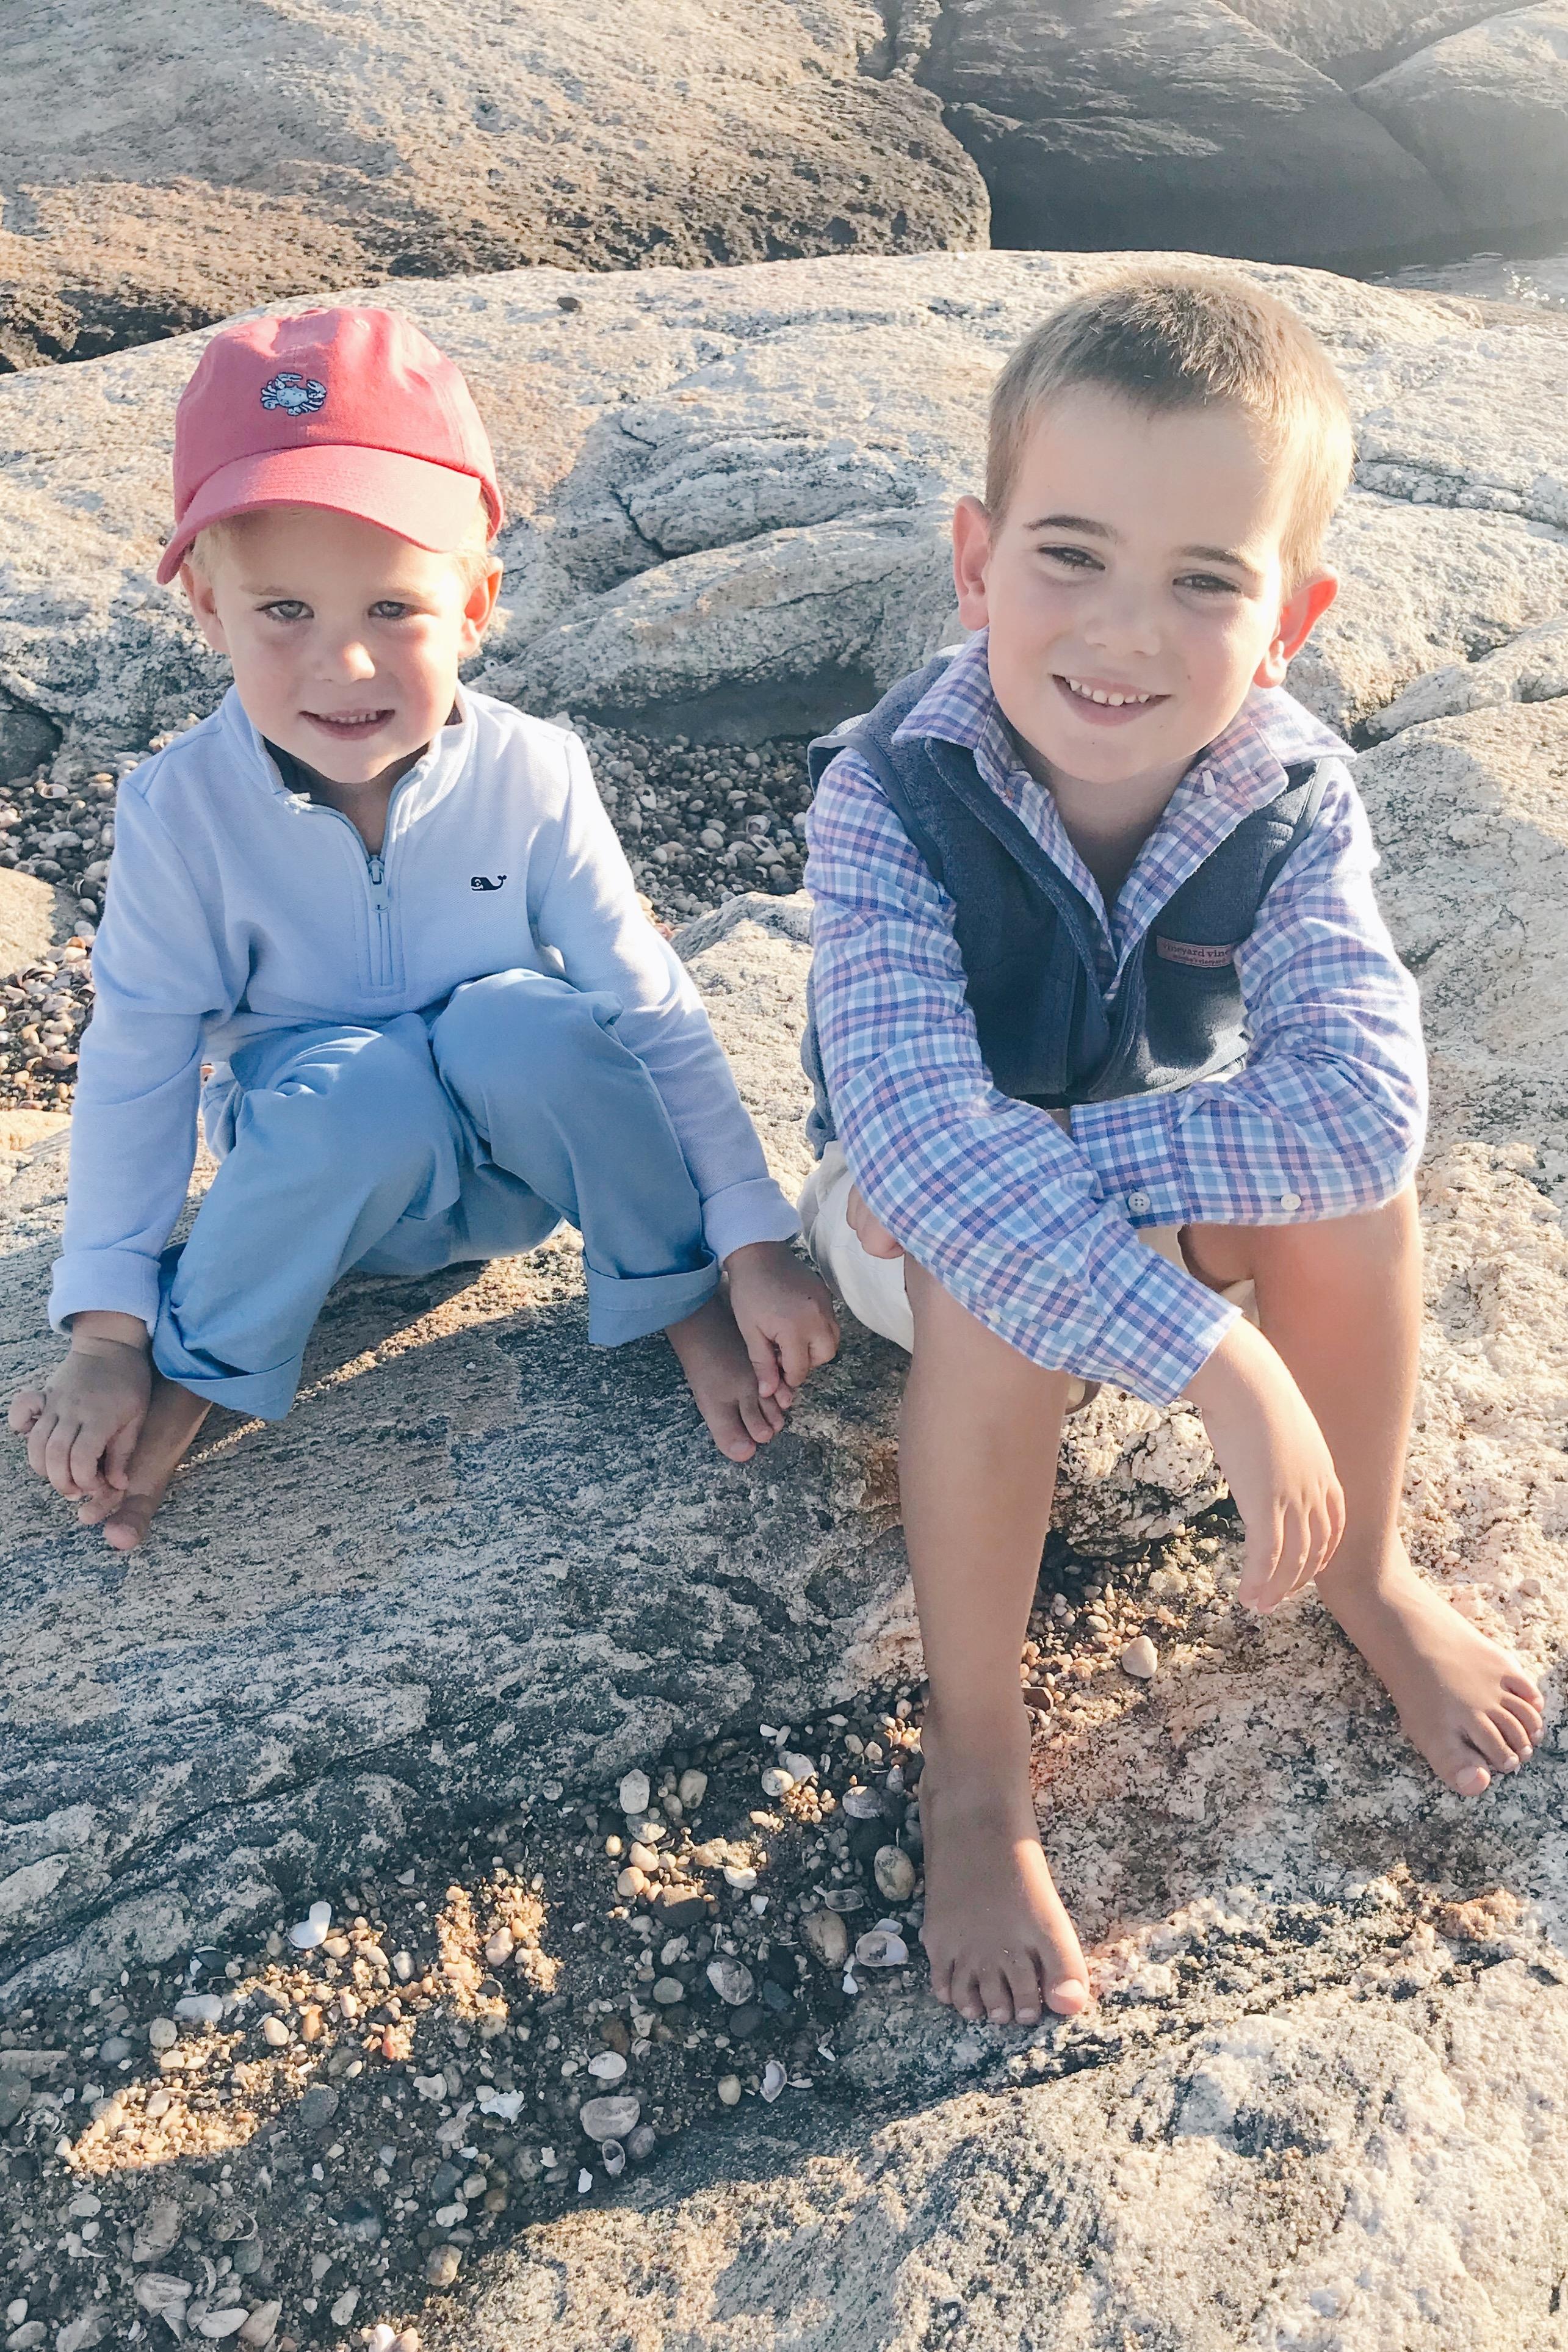 Vineyard Vines Boy Outfits - Connecticut Lifestyle Bloggger Pinteresting Plans sons